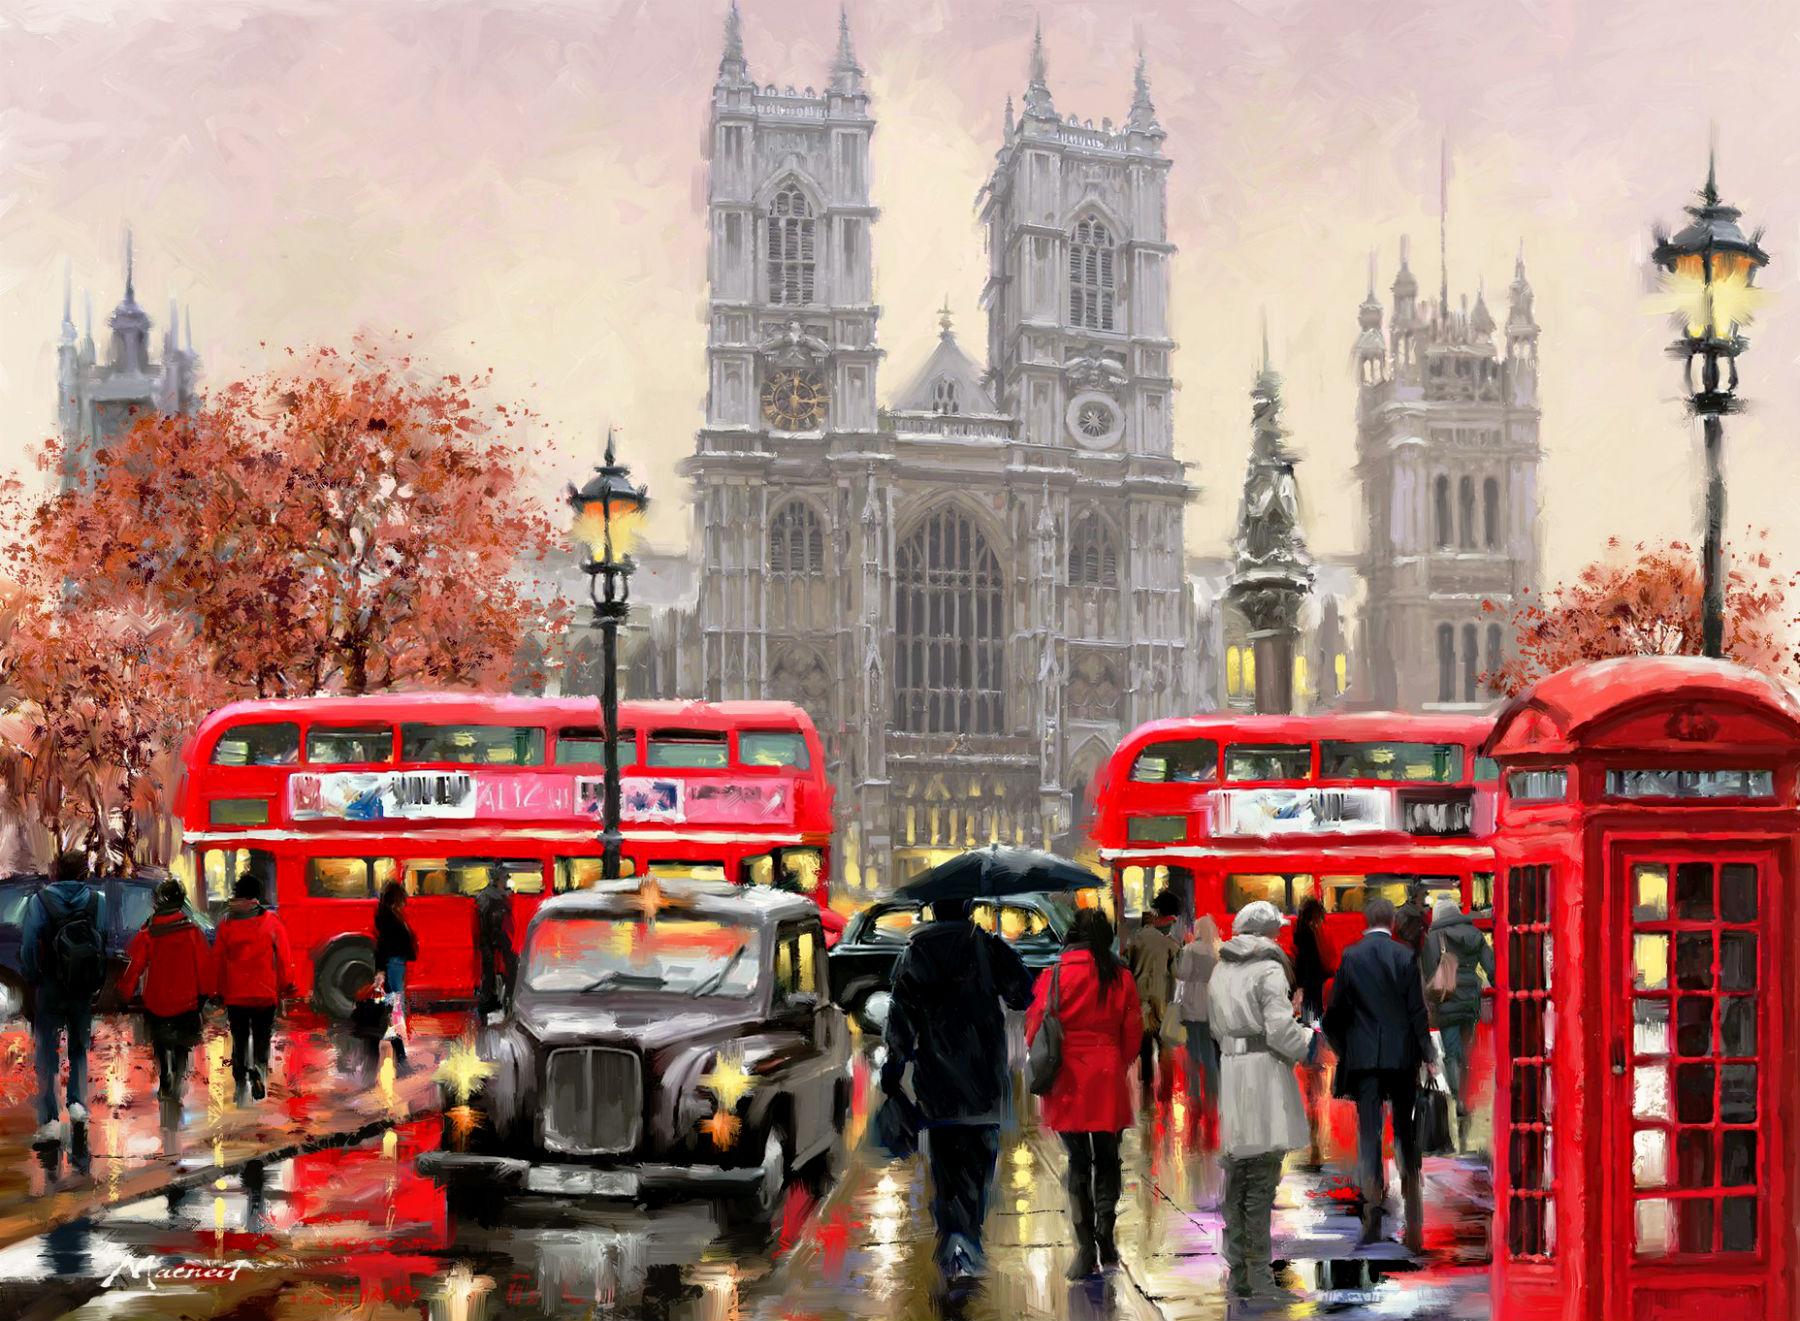 Картинки и рисунки с великобританией